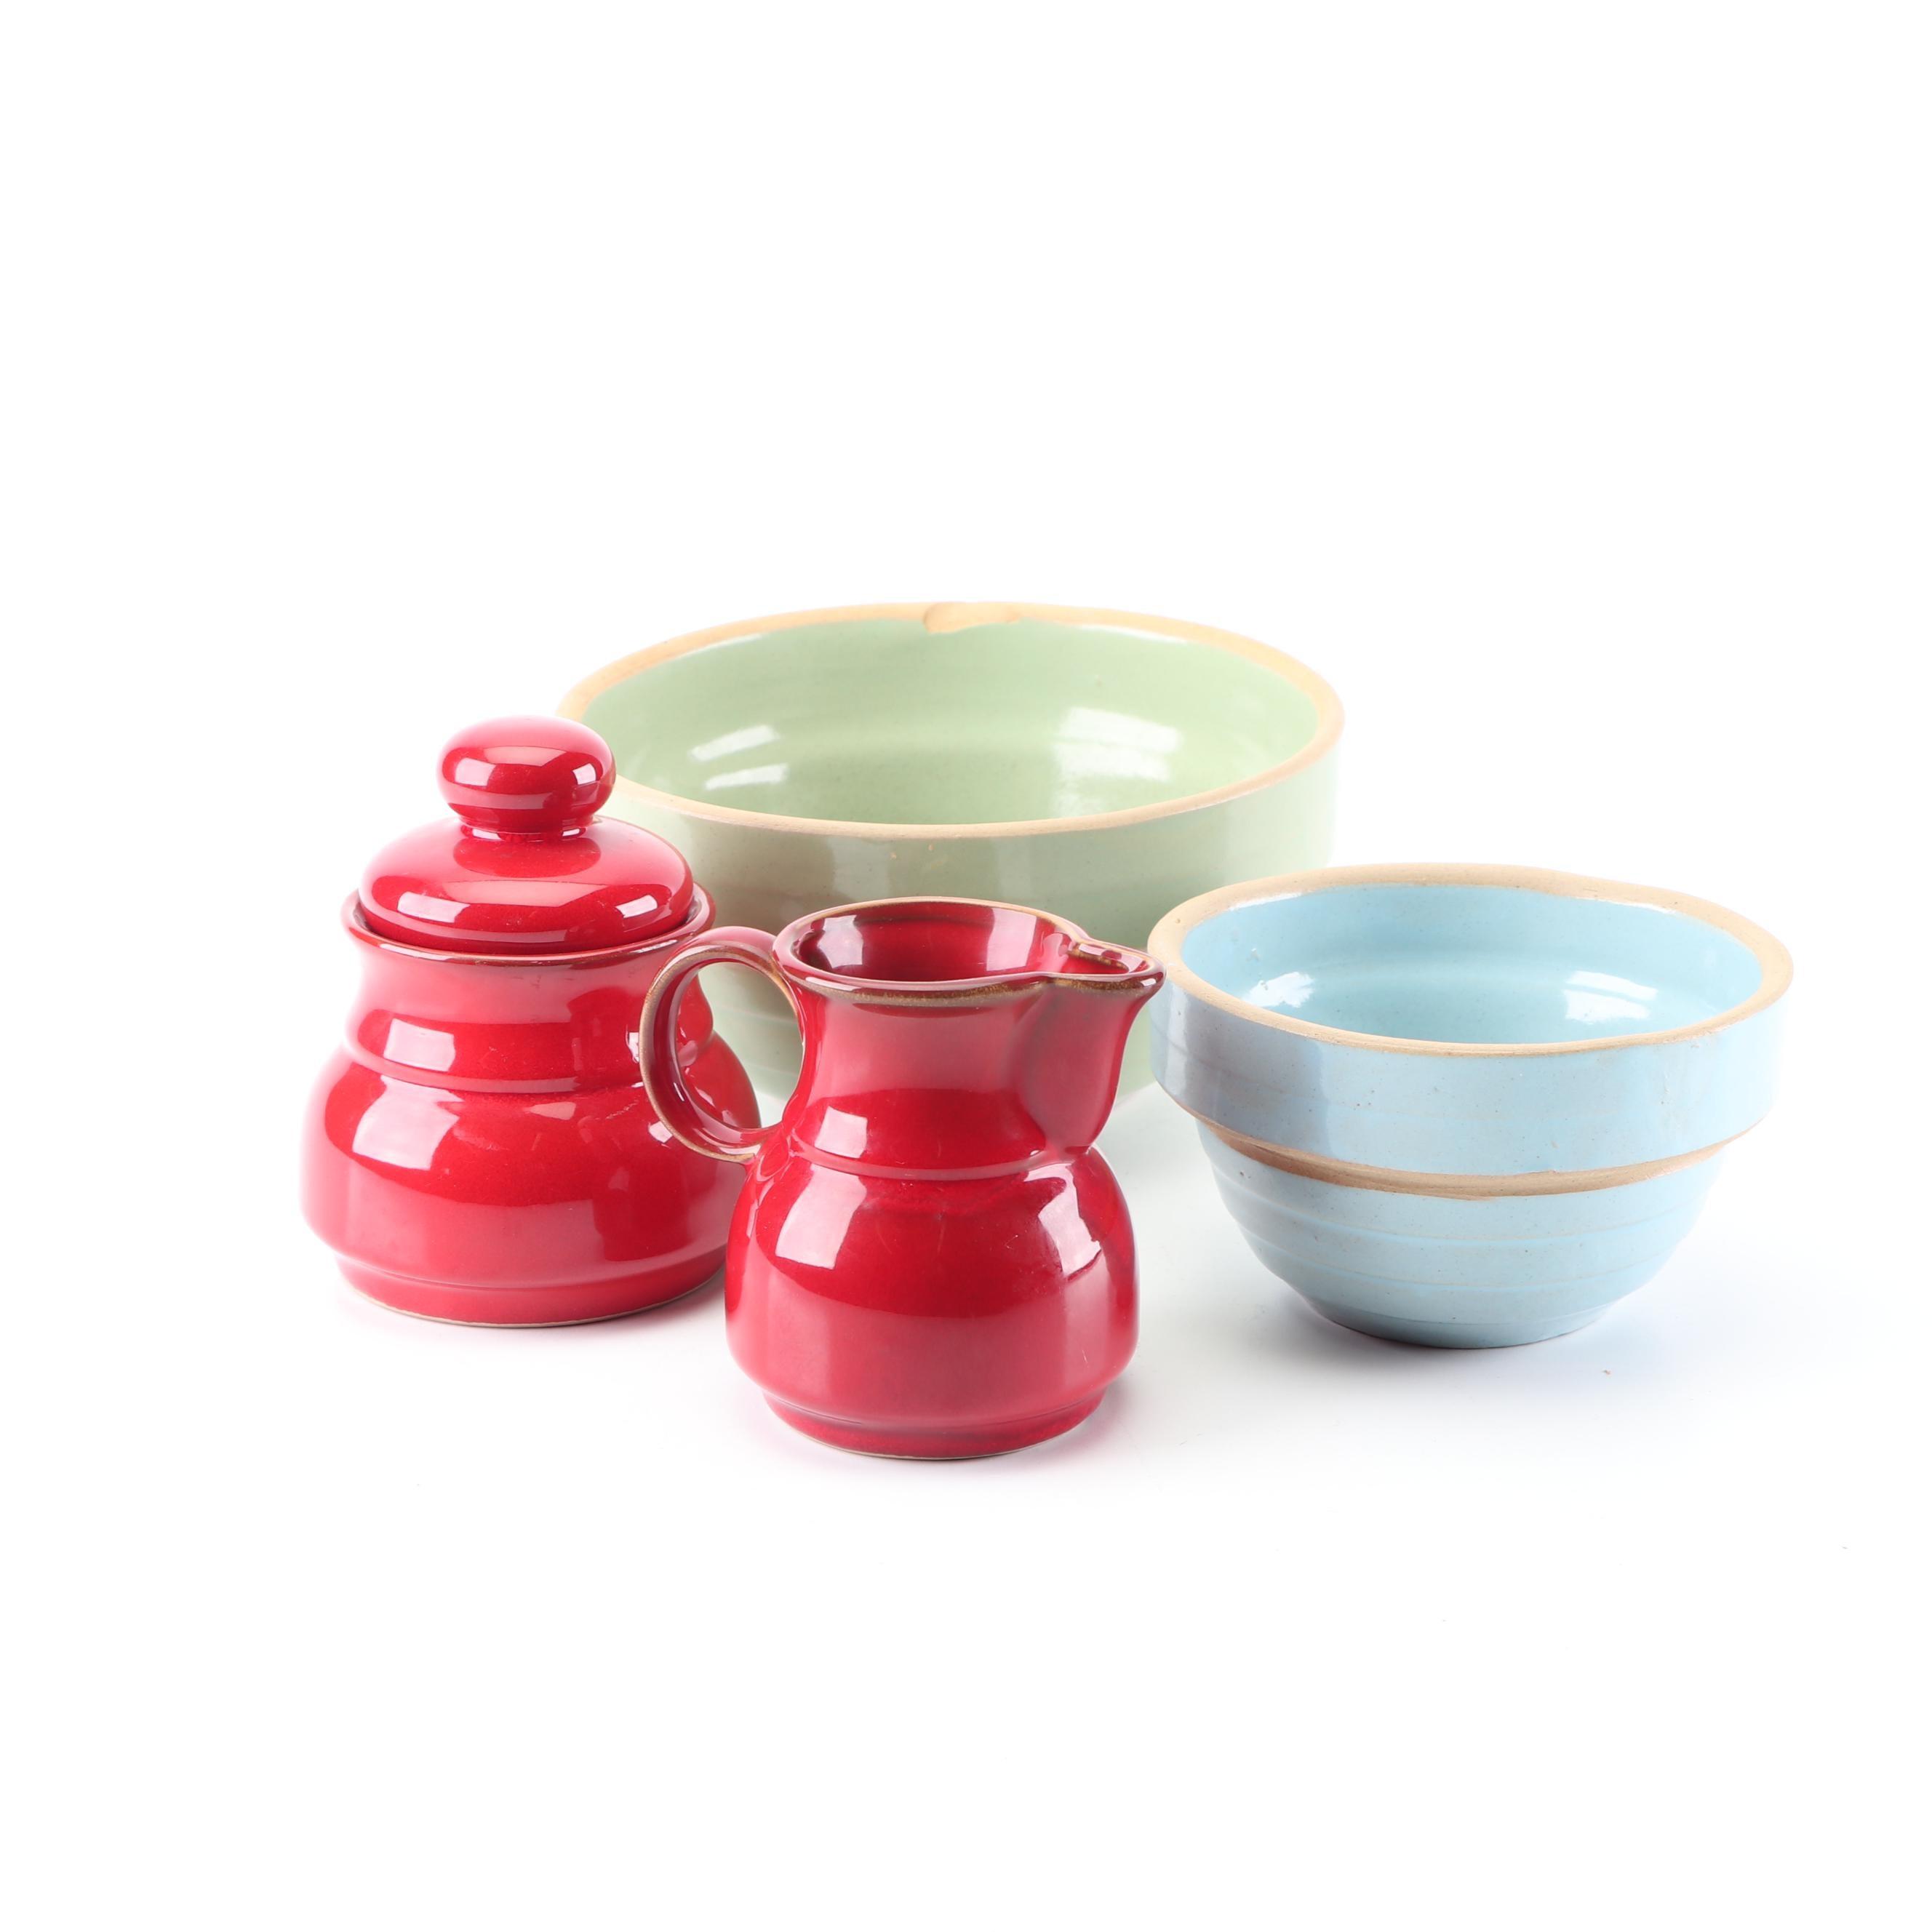 Stoneware Creamer and Sugar with Mixing Bowls